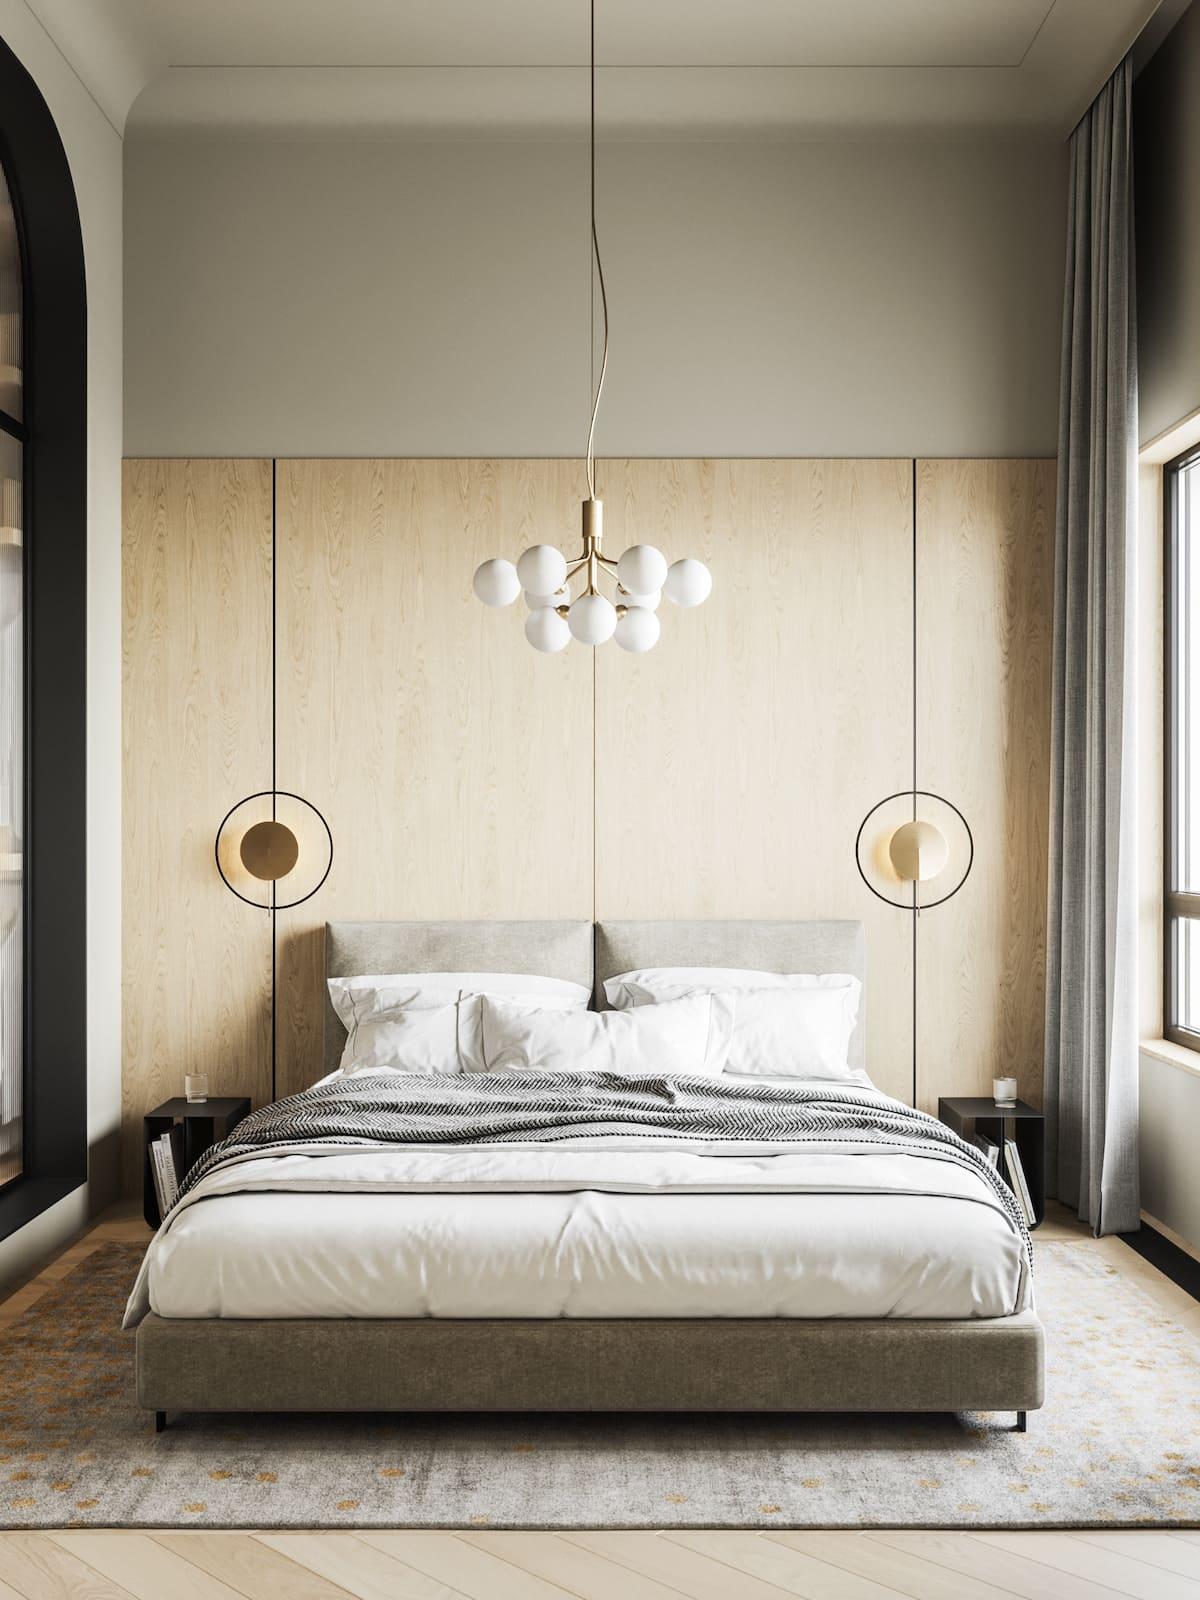 дизайн интерьера модной квартиры фото 25